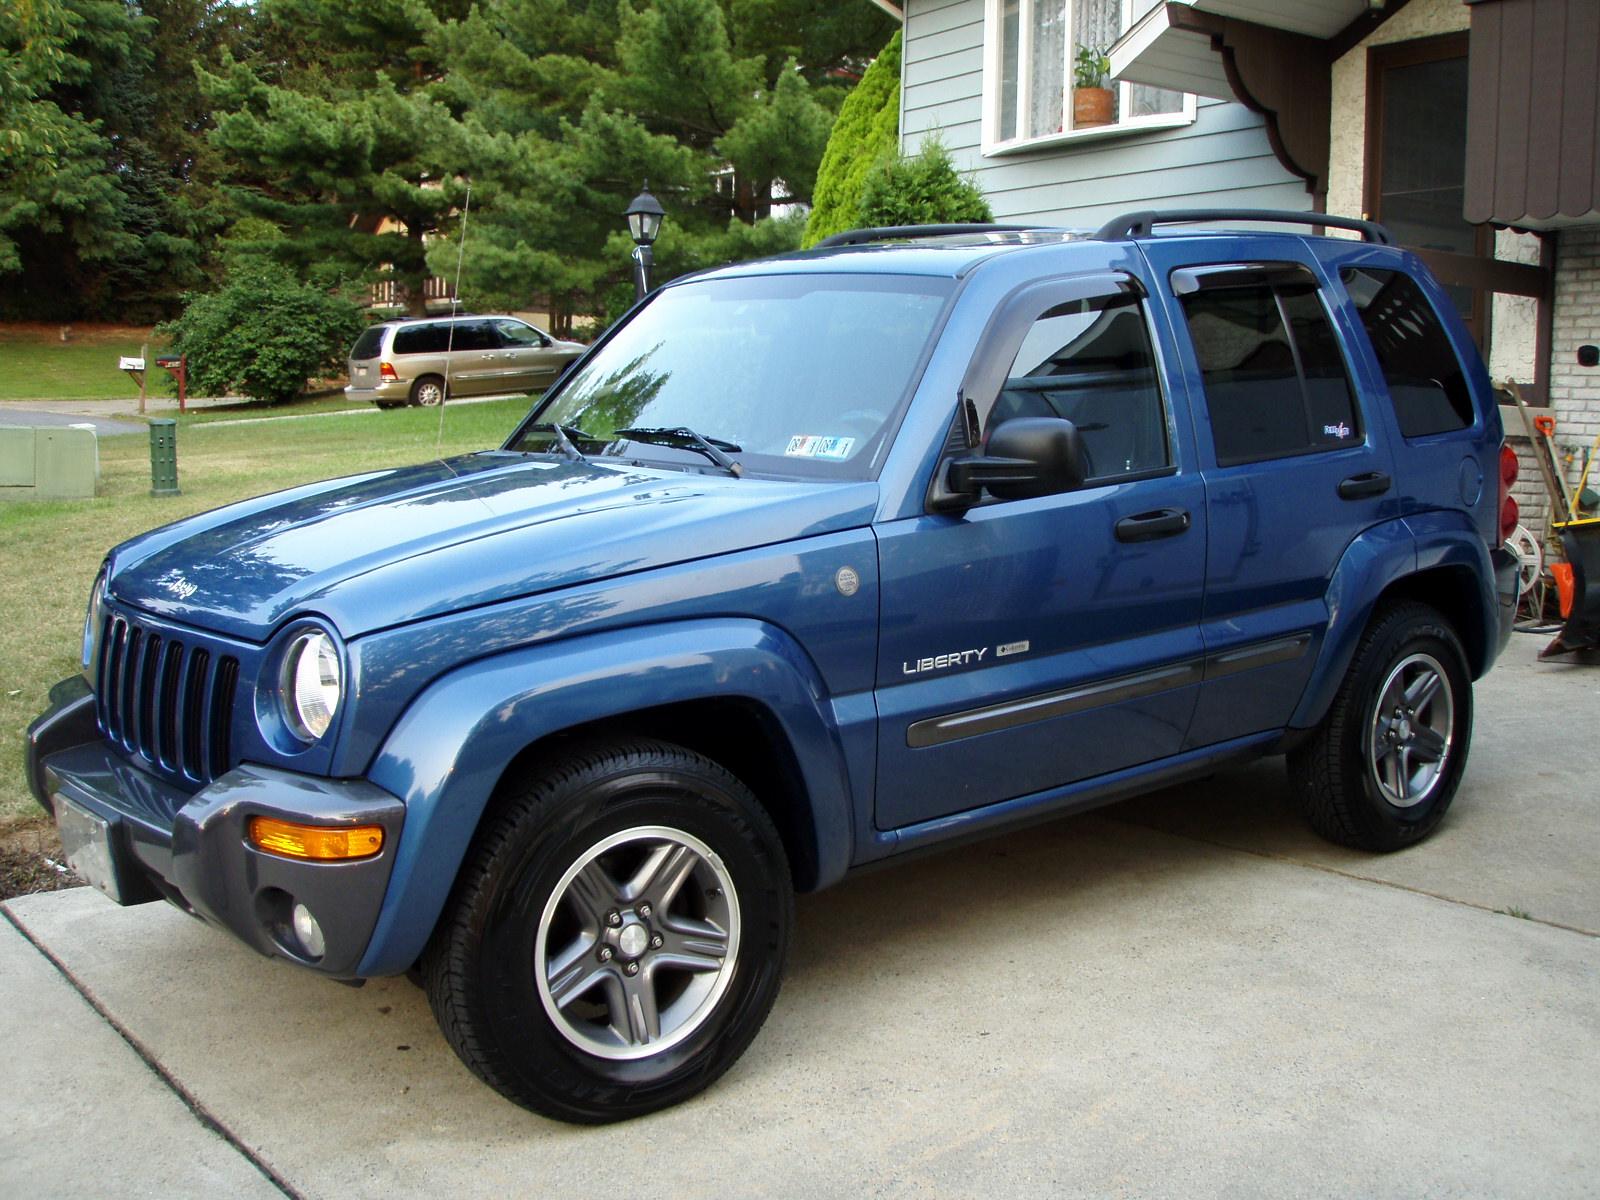 Jeep liberty 2004 blue 2016 jeep liberty 2004 blue